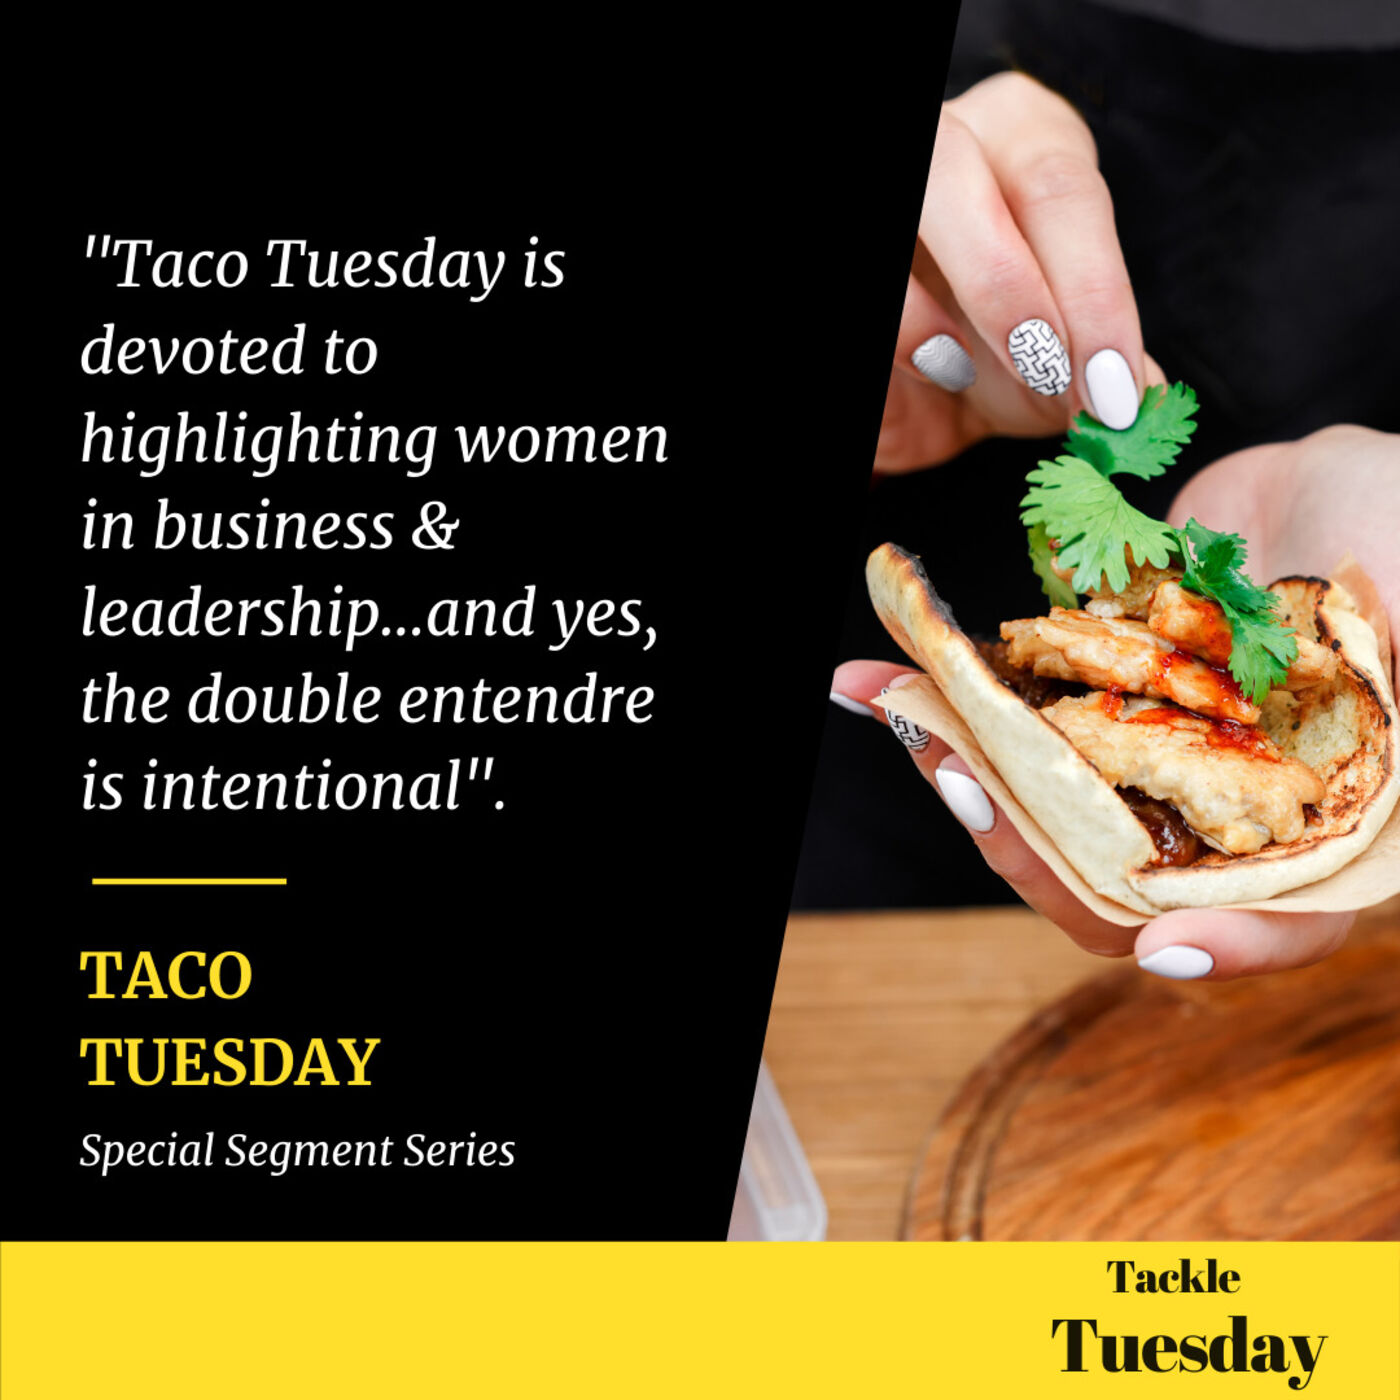 Taco Tuesday | Special Segment Series Trailer